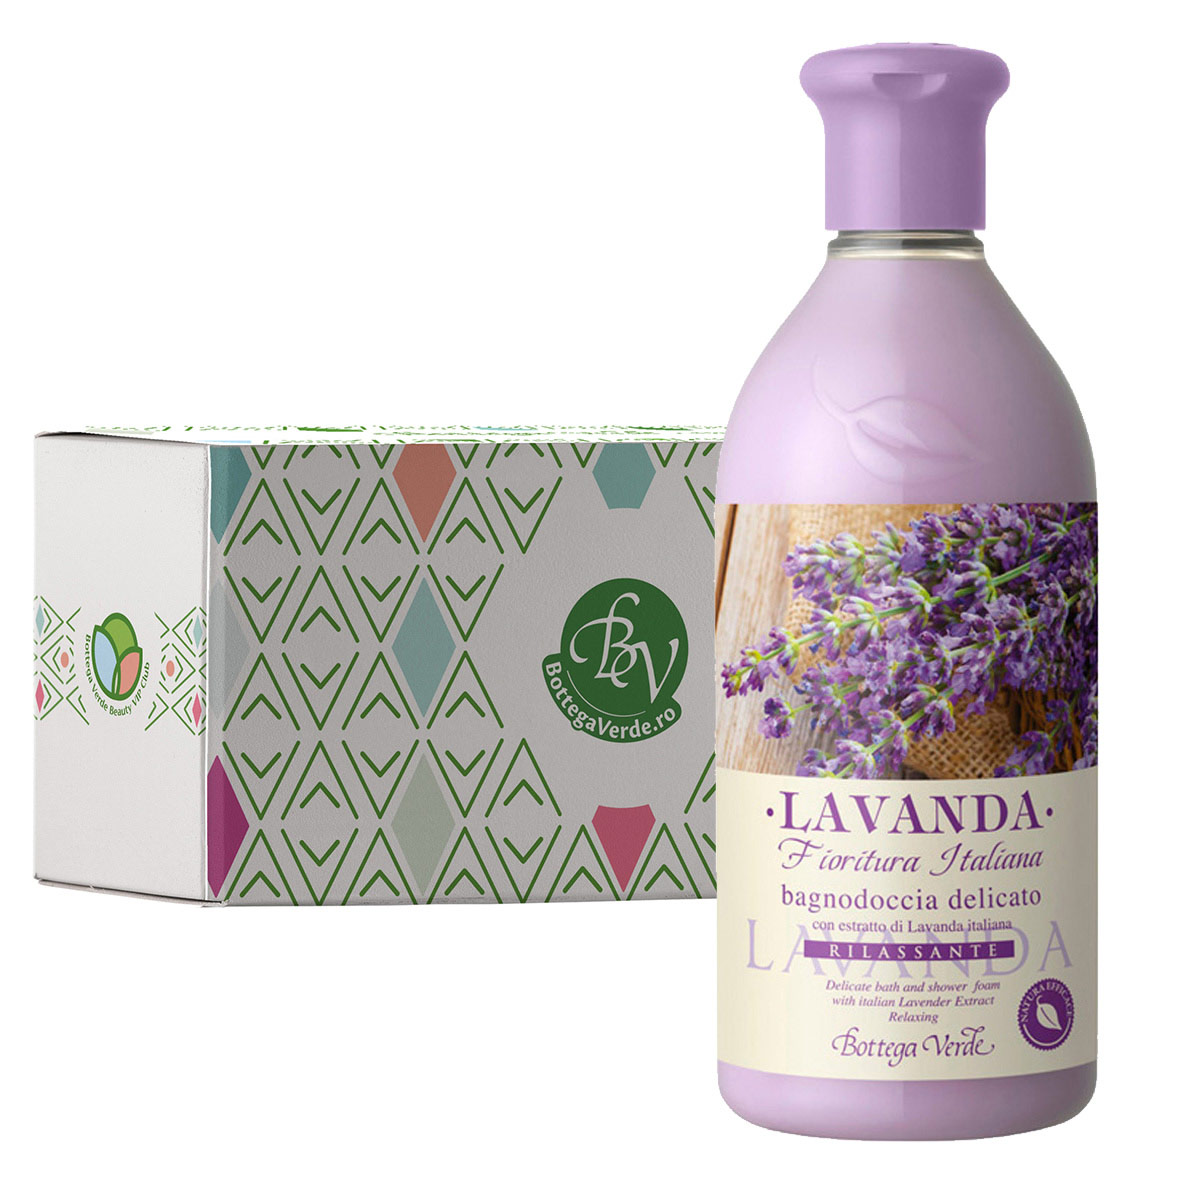 Gel de dus cu extract de lavanda italiana in cutie cadou